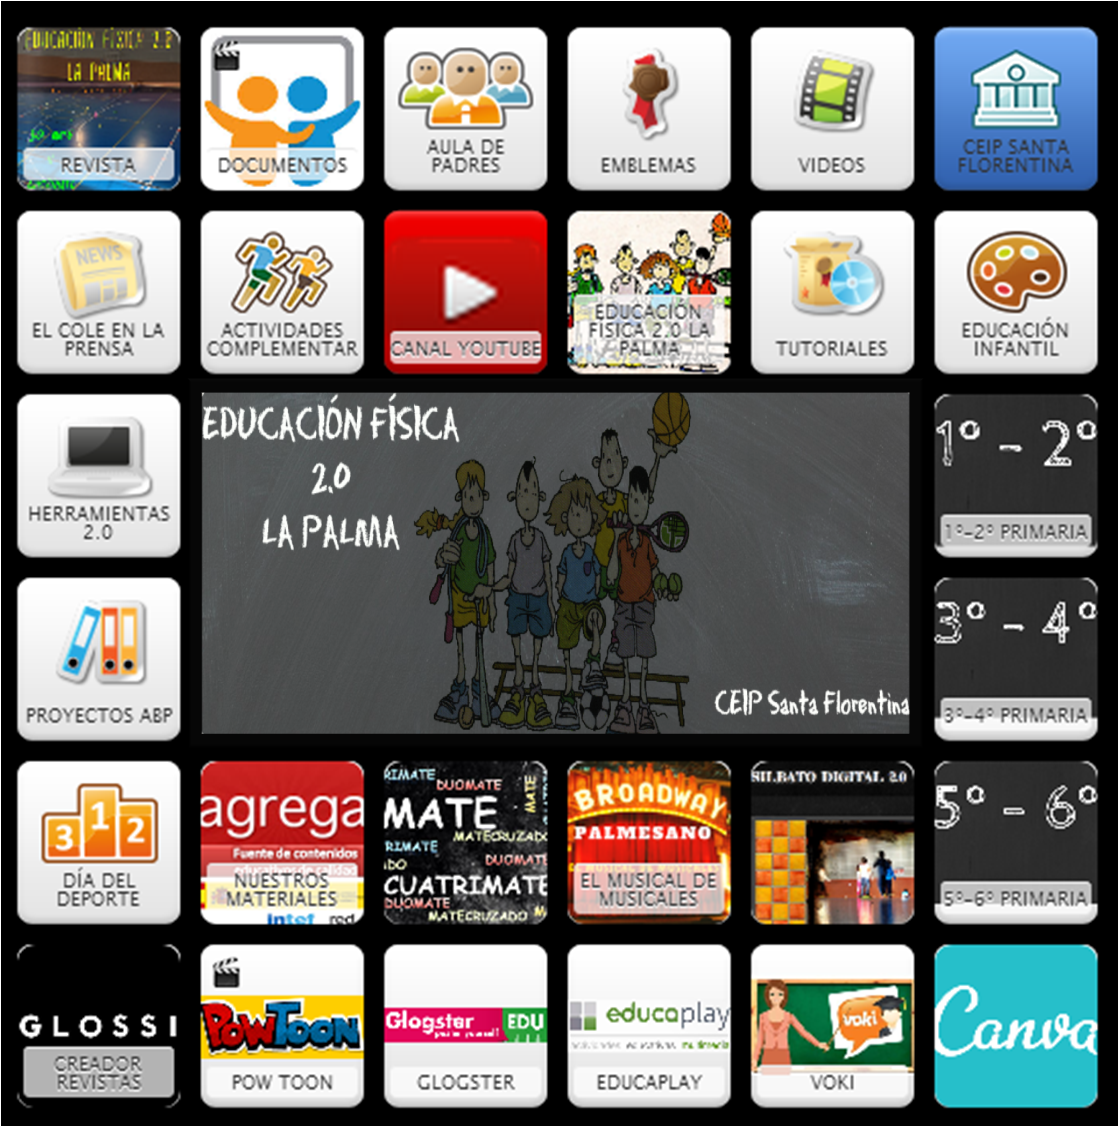 Recursos Tic EF 2.0 La Palma